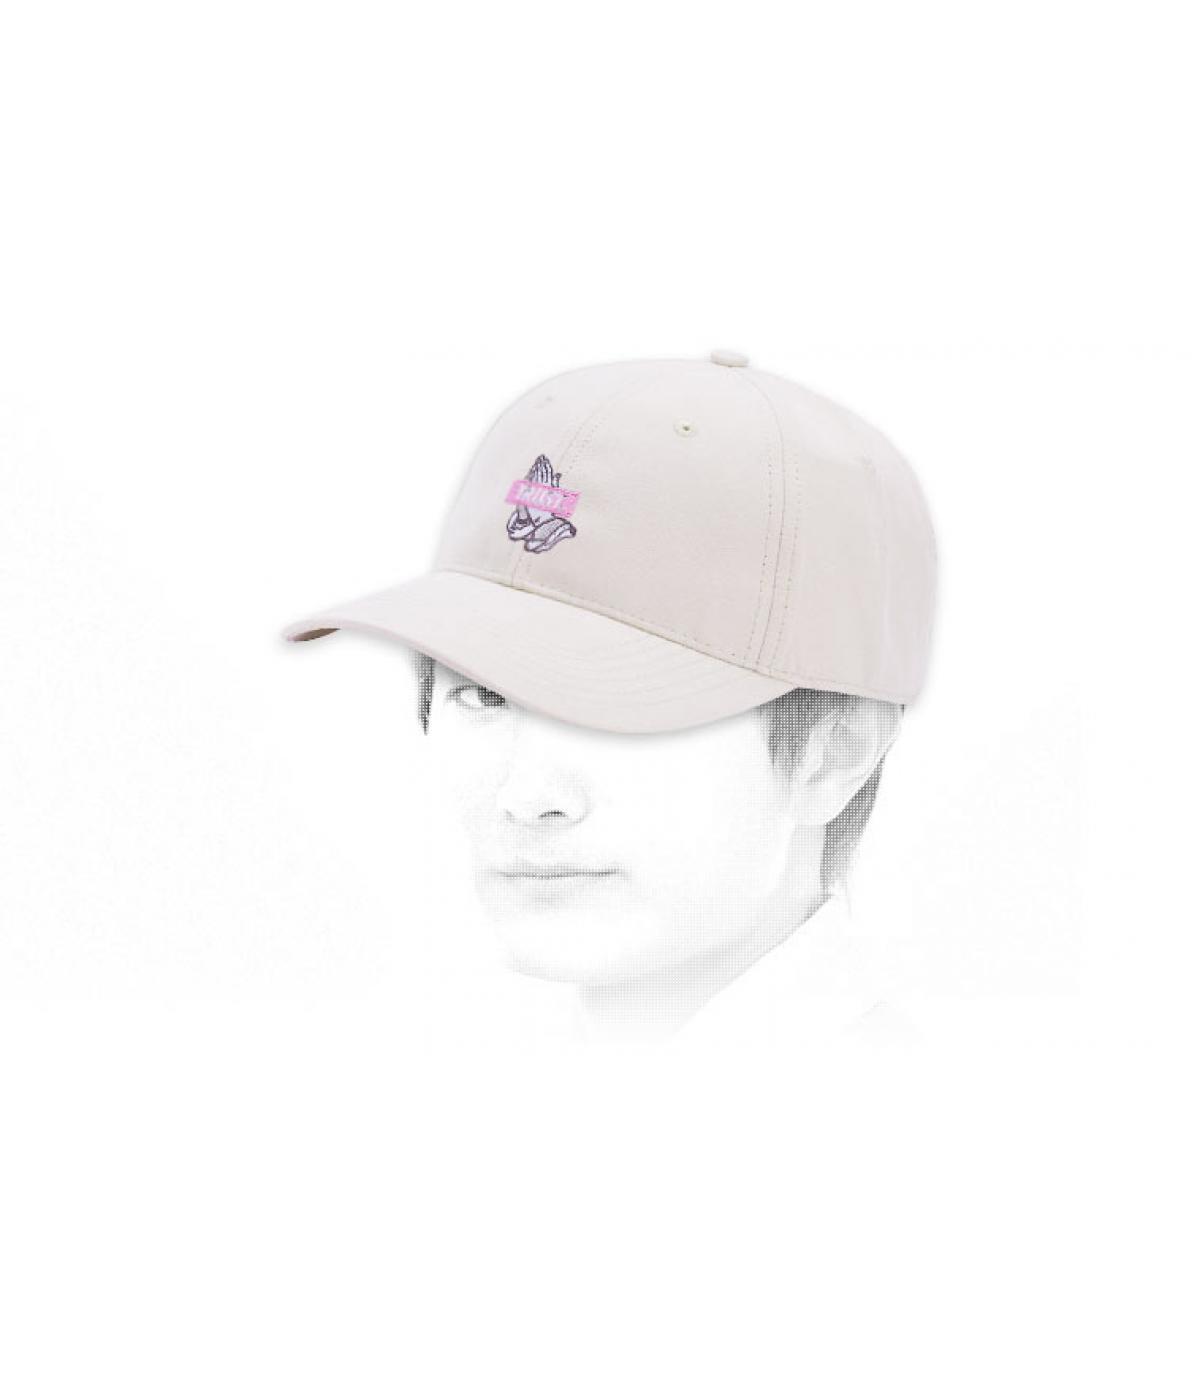 cappello beige di fiducia Cayler